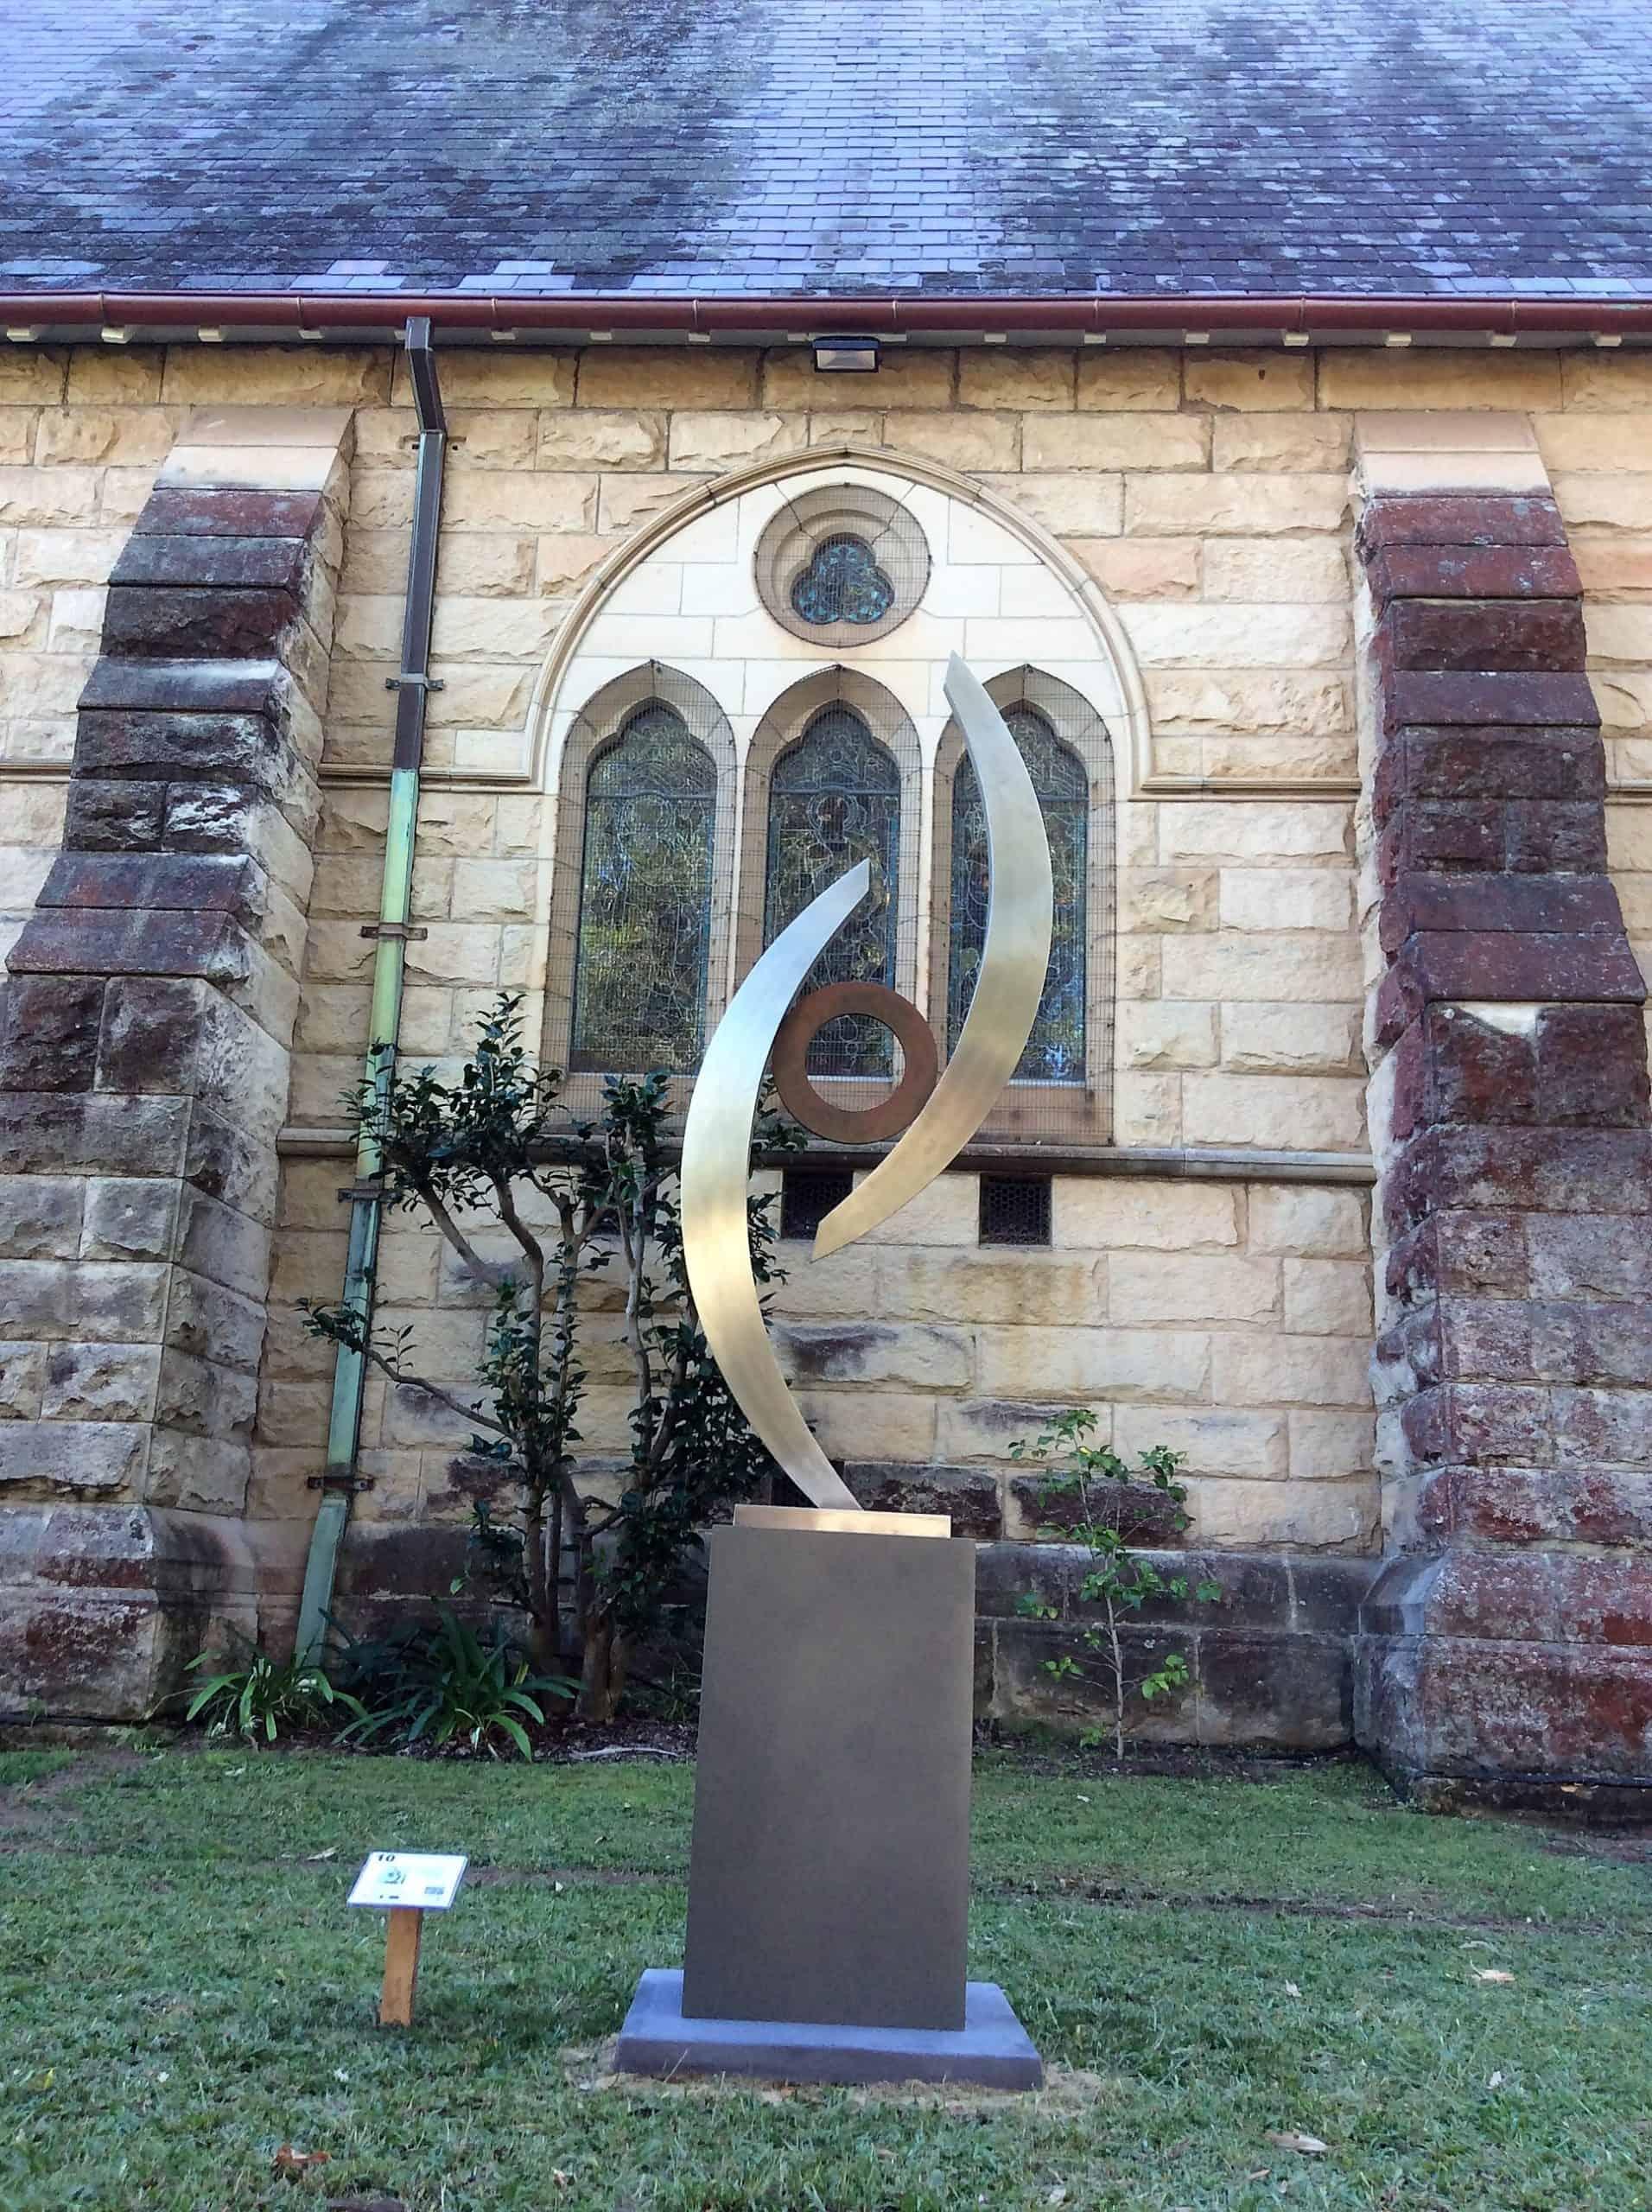 Embrace162x56cm-STAINLESSS-&-BRONZE-in-situ[bronze,free-standing,Stainless-steel,Outdoor,]-Ben-Fasham-abstract-garden-sculpture-australian-artist